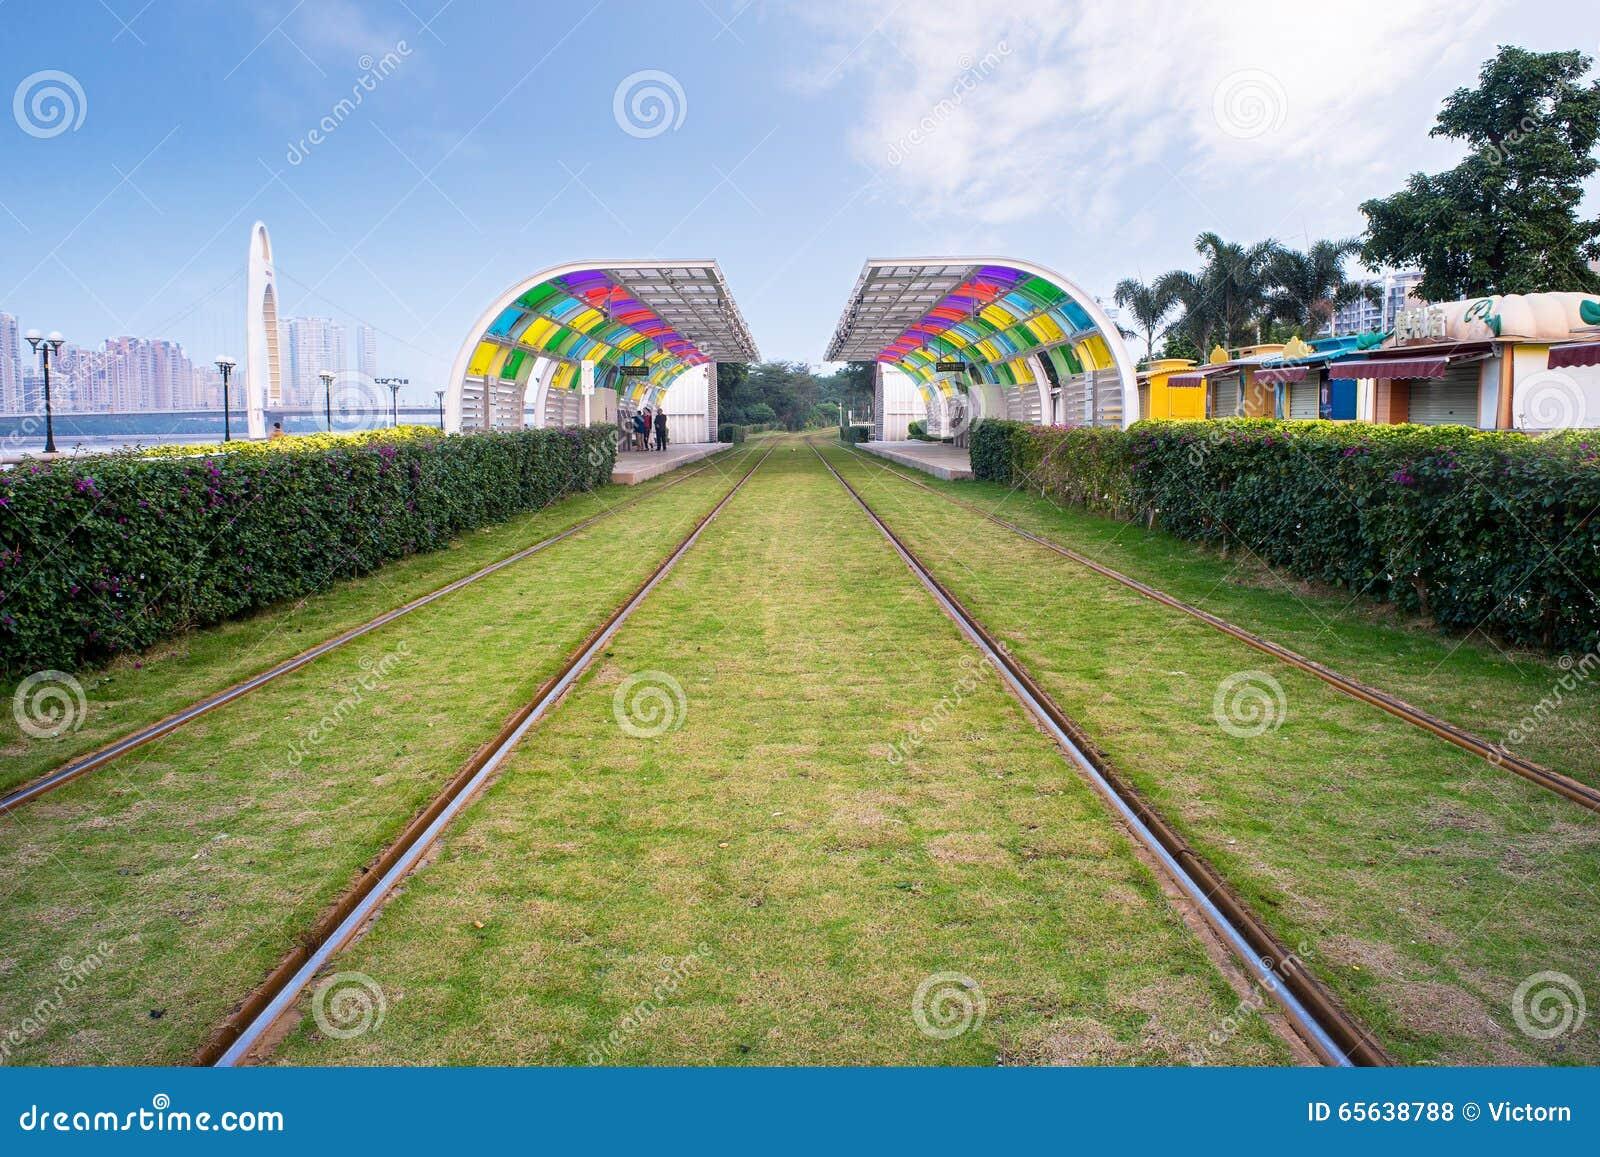 Fond de chemin de fer